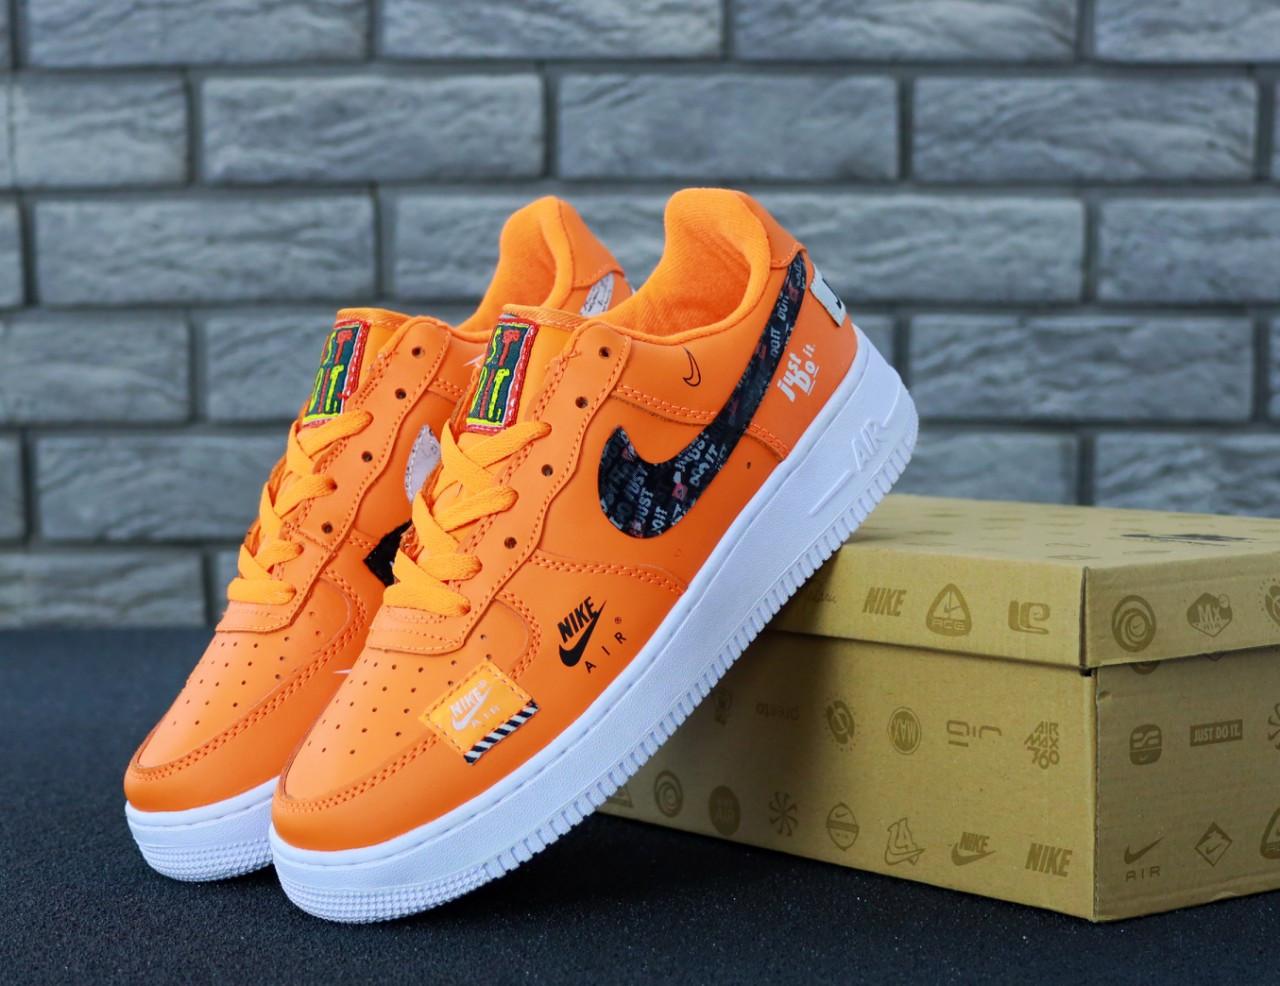 Мужские кроссовки Nike Air Force 1 Low Just Do It Orange . ТОП Реплика ААА класса.